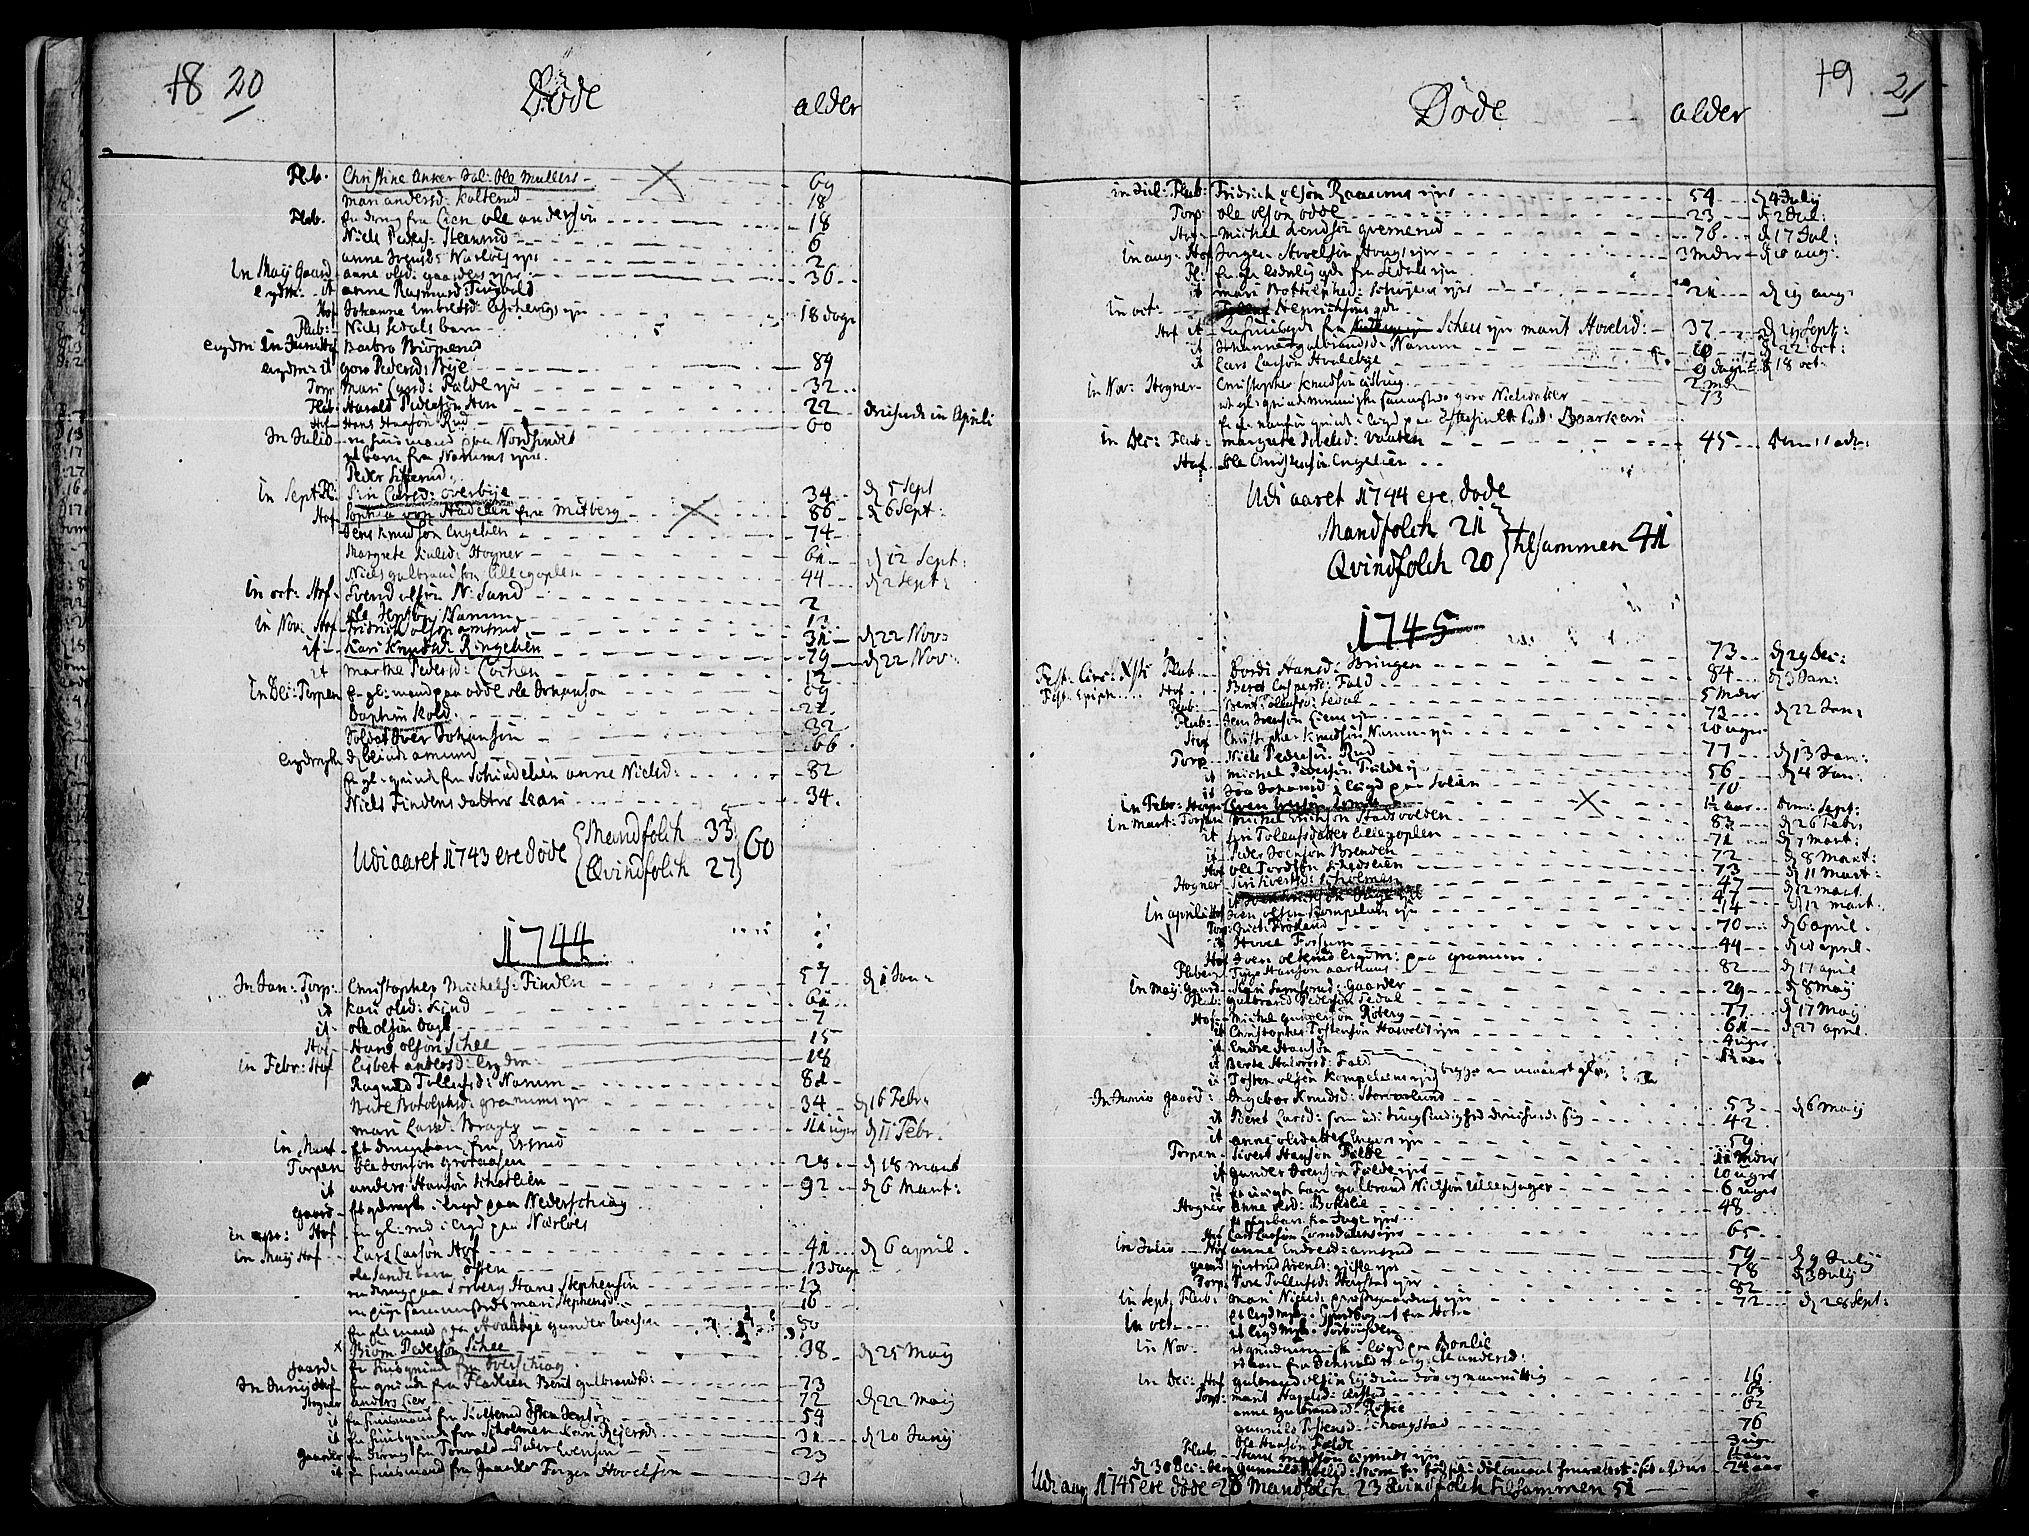 SAH, Land prestekontor, Ministerialbok nr. 4, 1733-1764, s. 20-21